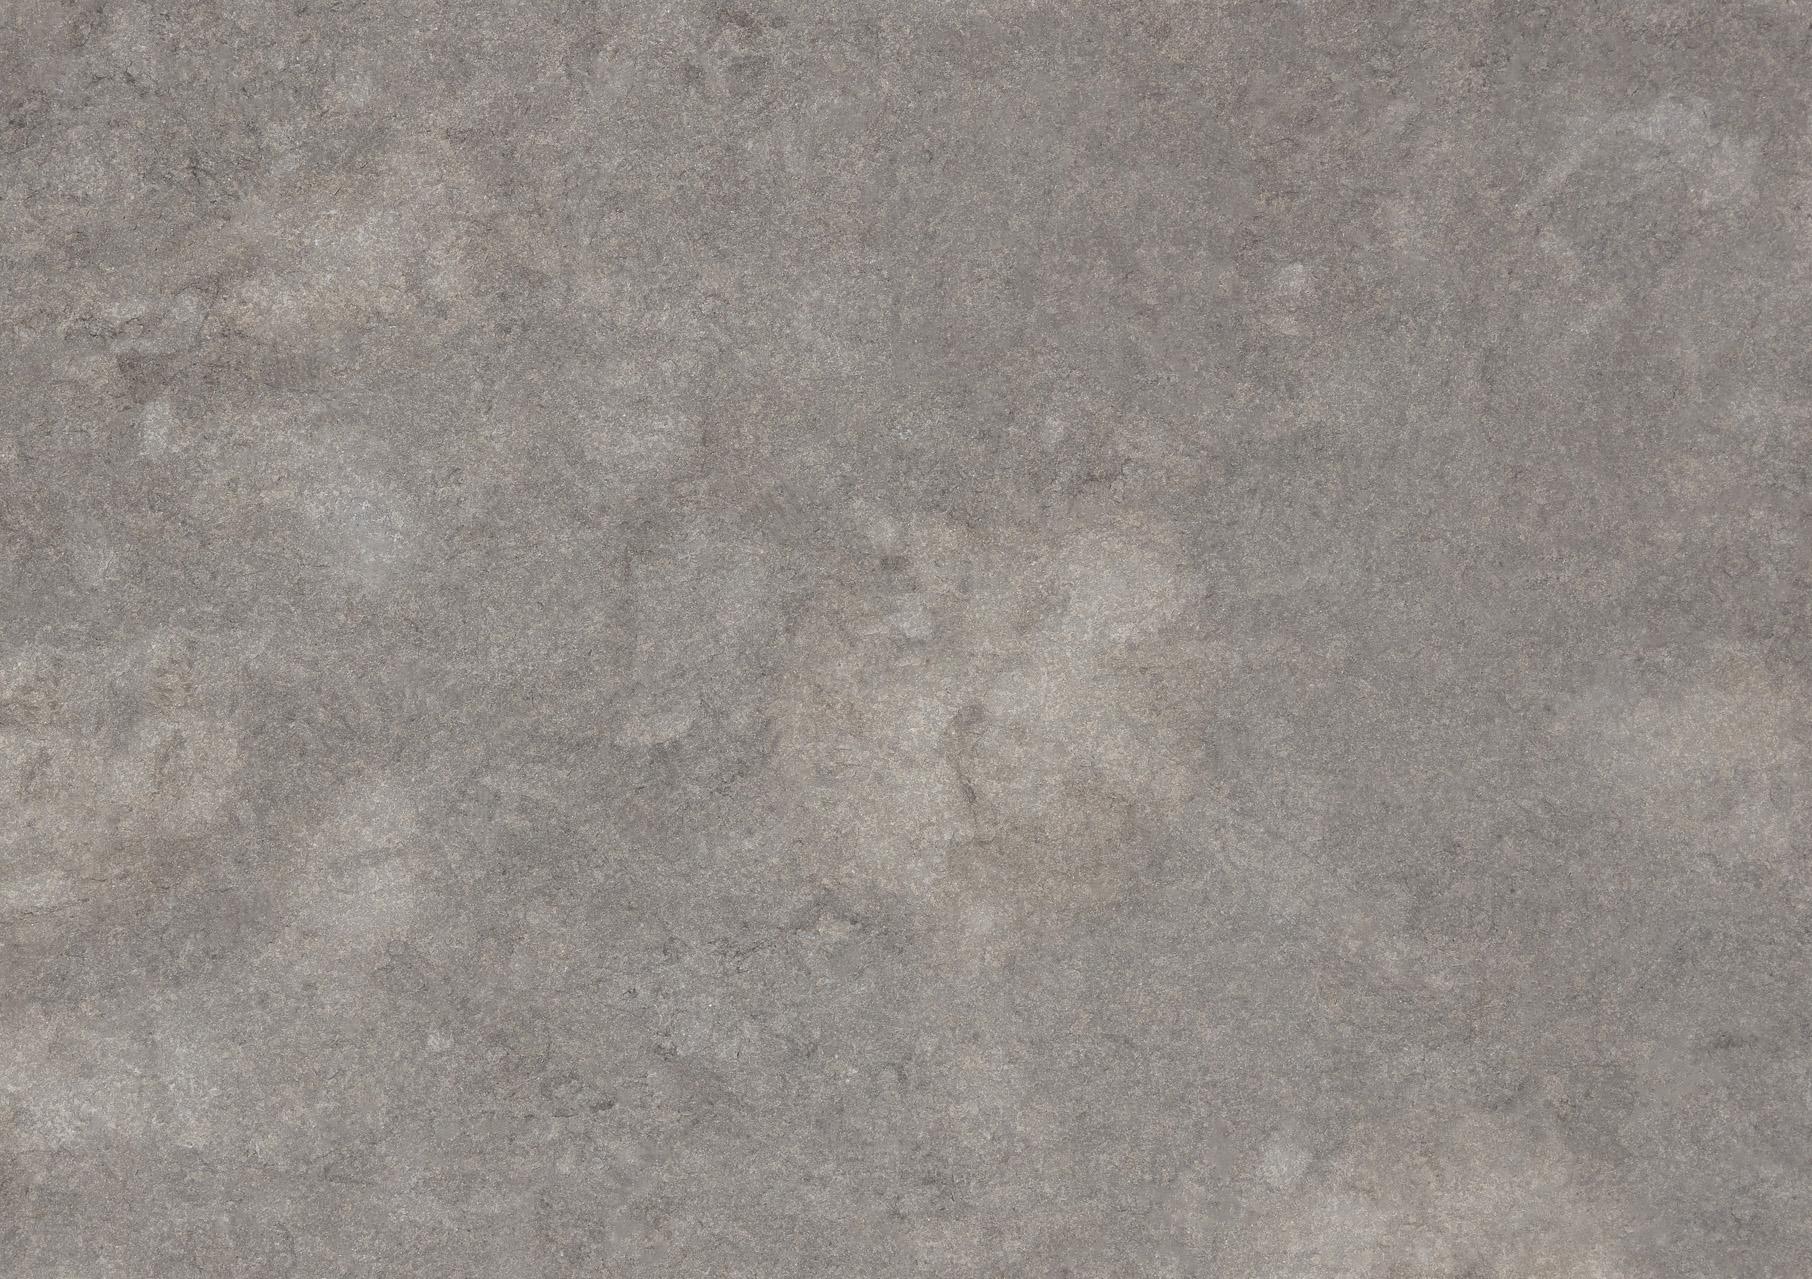 Artedomus Pietra Bronzea